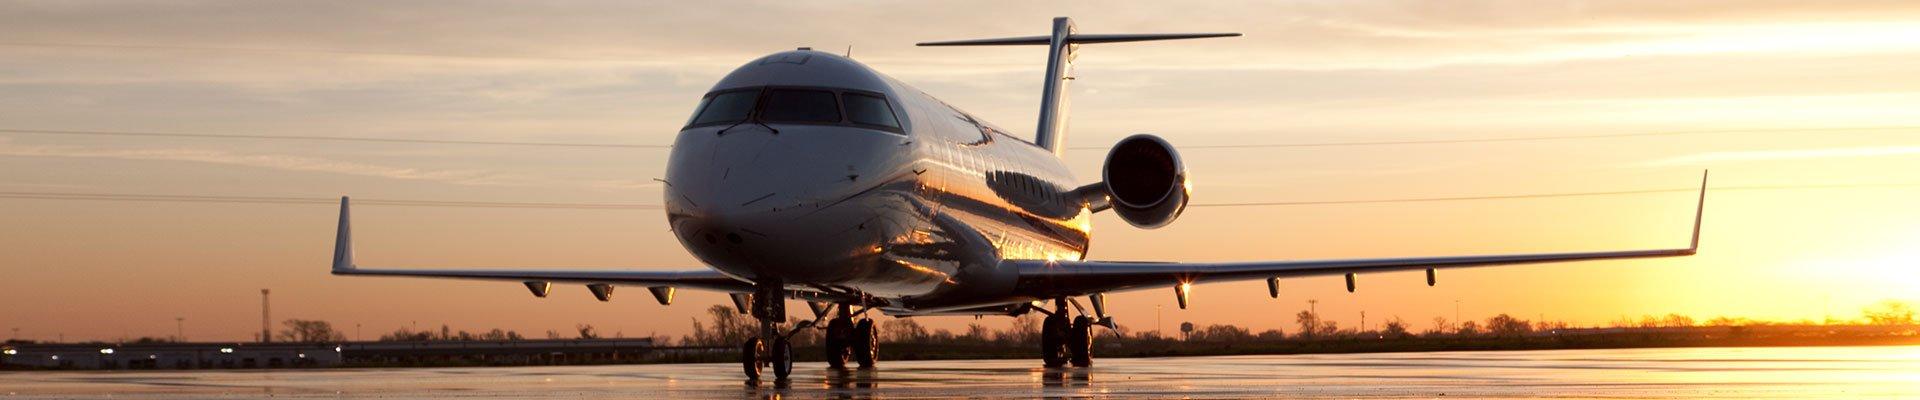 Vliegtuig verhuur